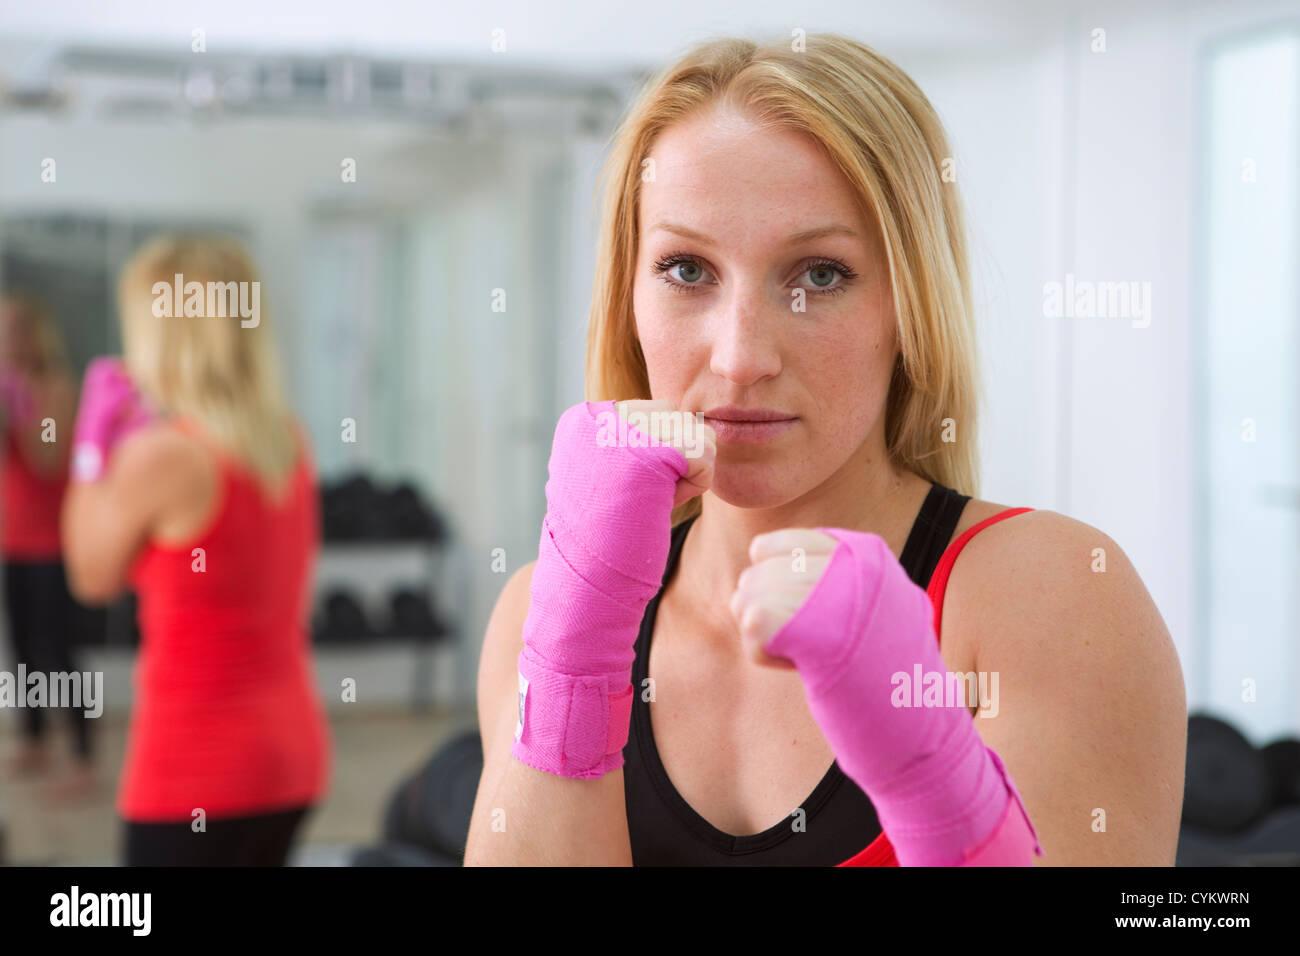 Boxer Fäuste hochhält, im Fitness-Studio Stockfoto